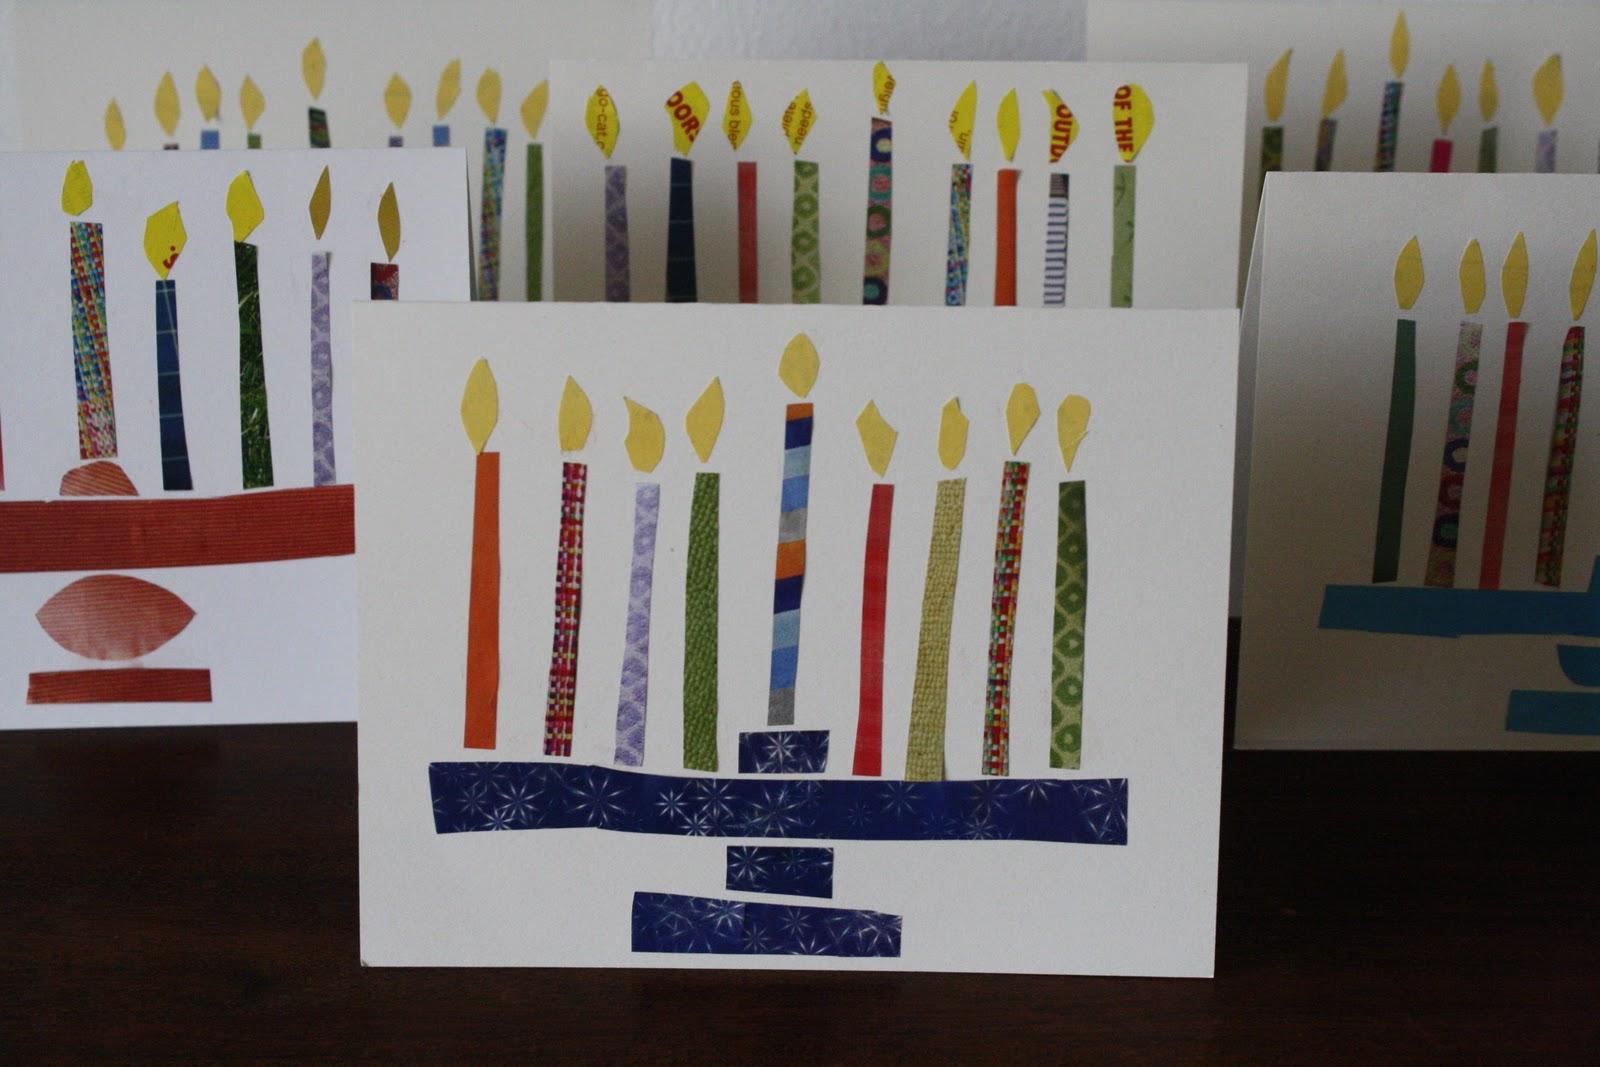 Hanukkah Greetings Lighted Menorah Happy Hanukkah Greeting Card